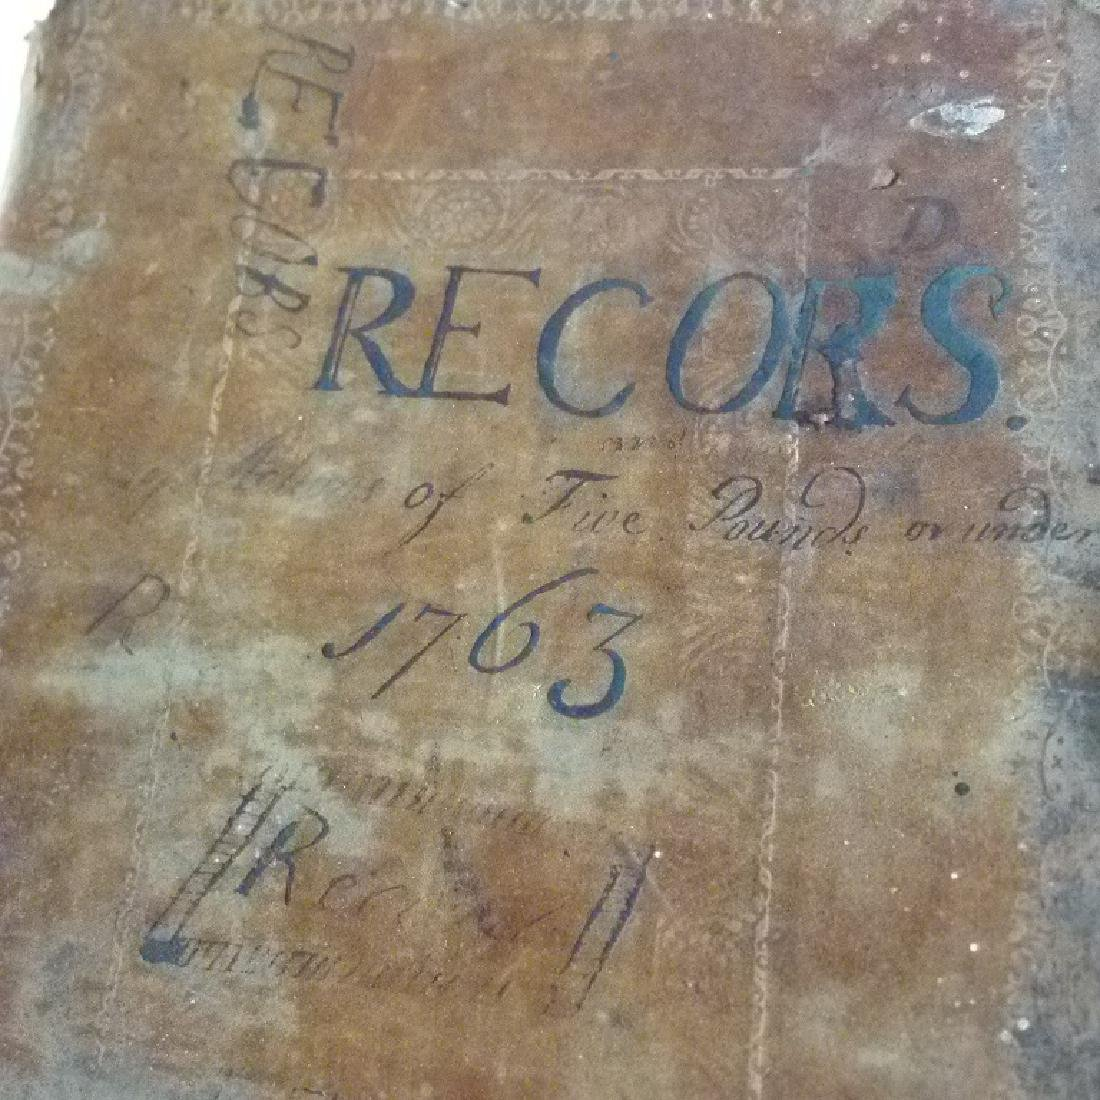 2 DUTCHESS COUNTY, NEW YORK LEDGERS/COURT RECORDS - 2